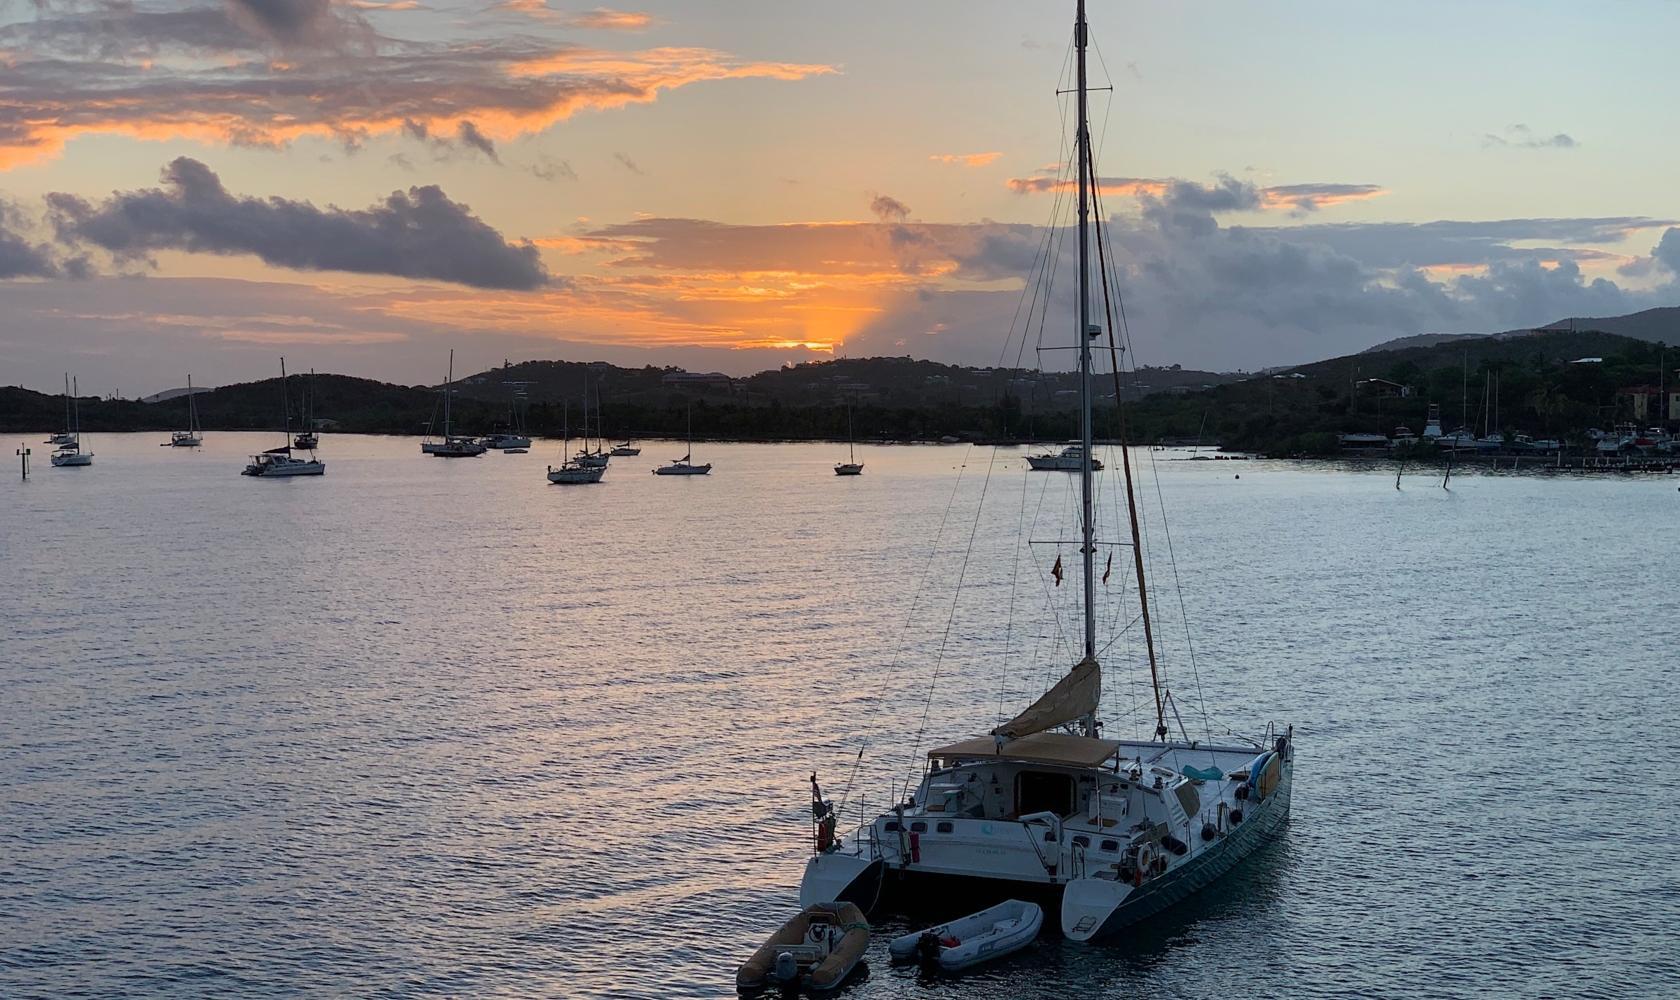 Sunrise on Christiansted Bay